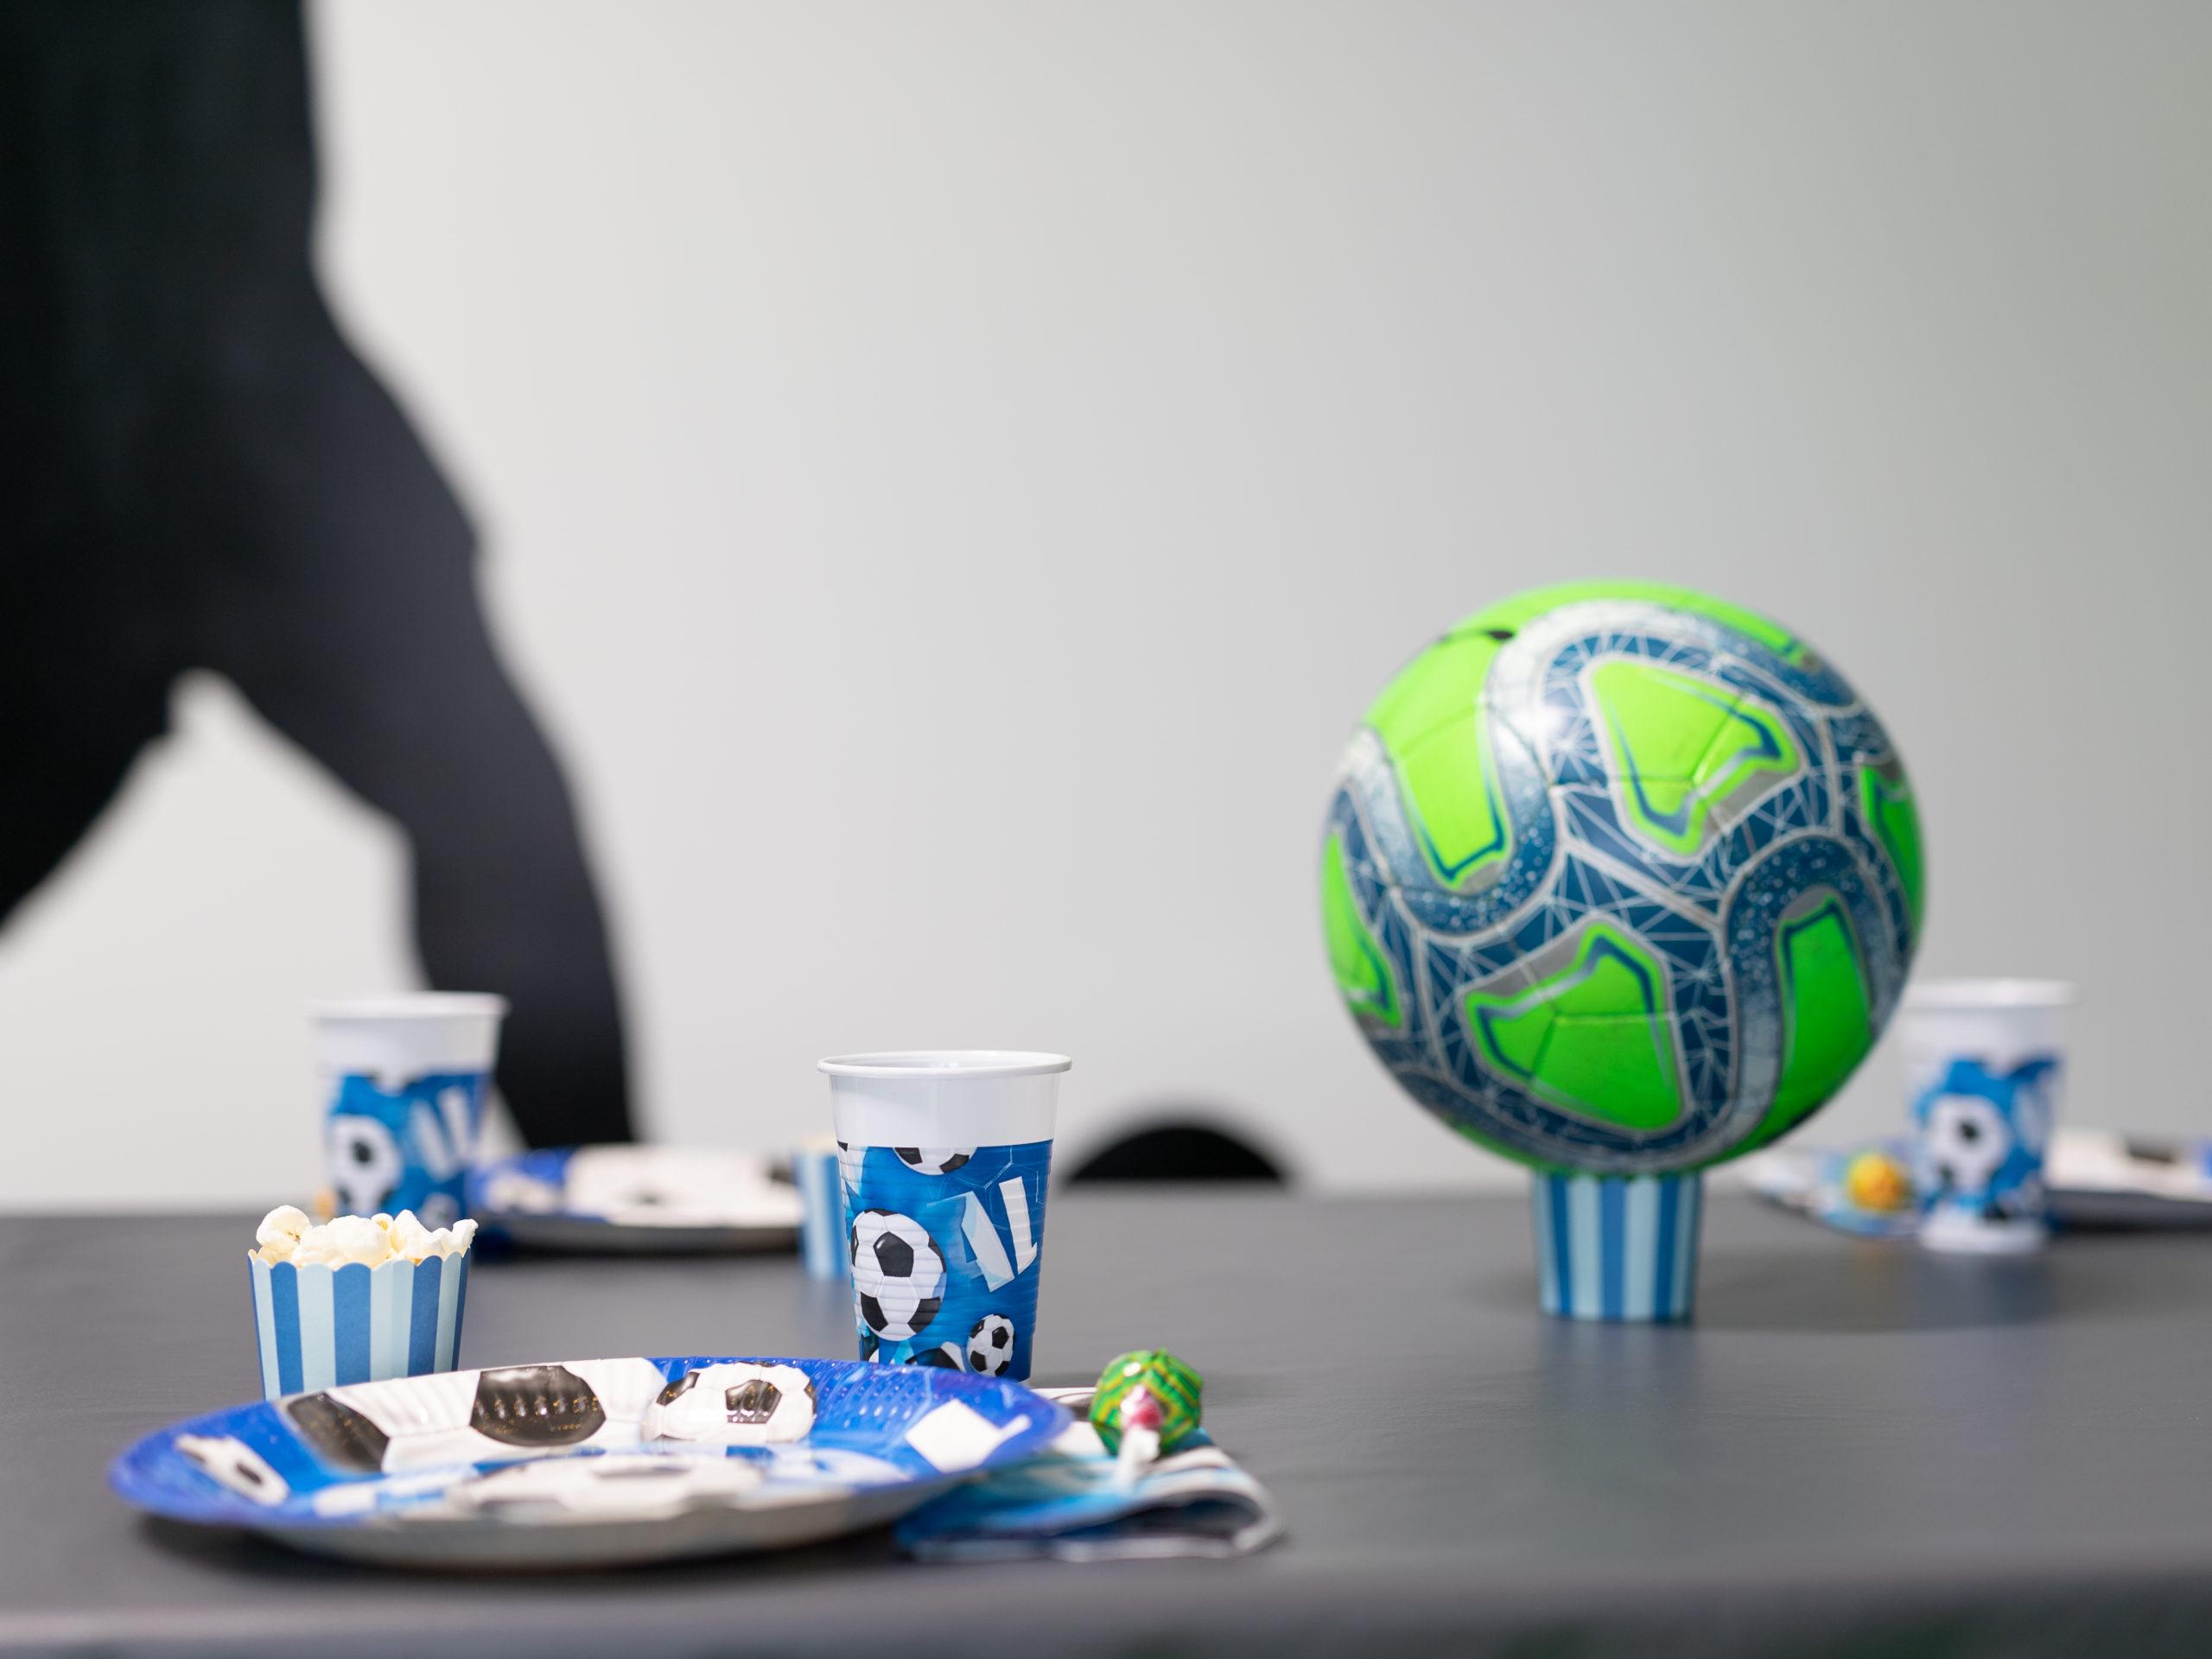 Fotballfest